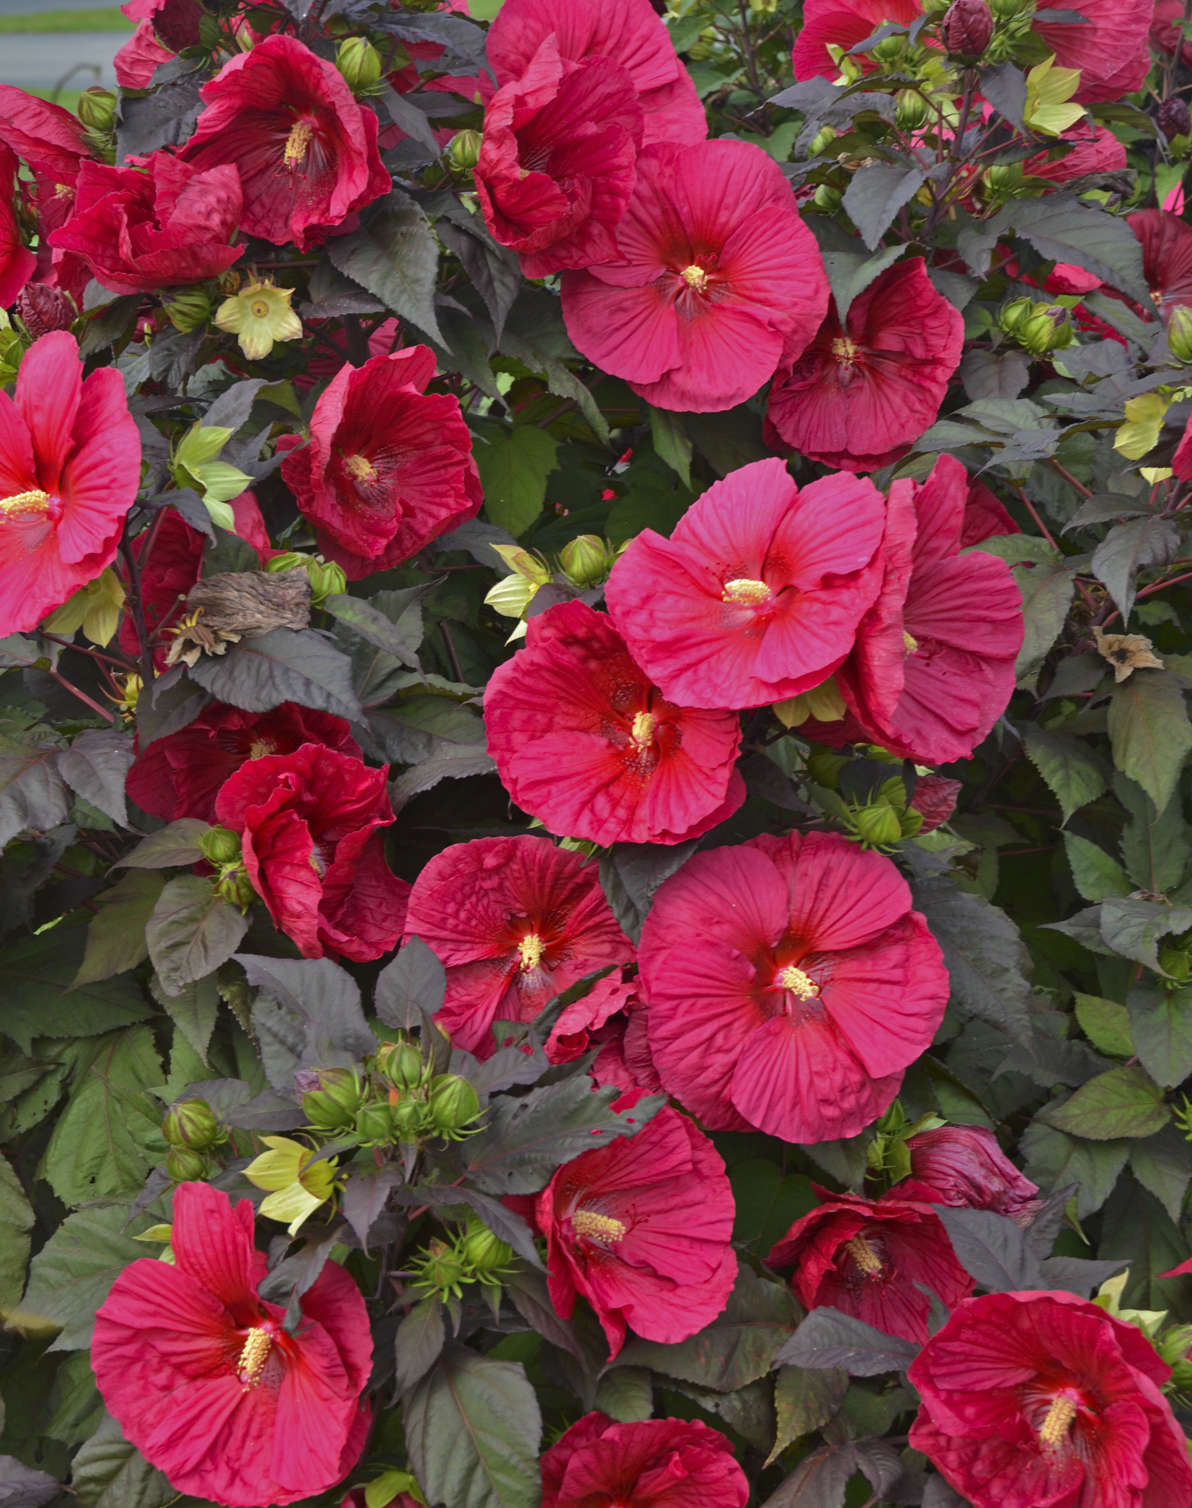 Hibiscus mars madness pp27838 walters gardens inc izmirmasajfo